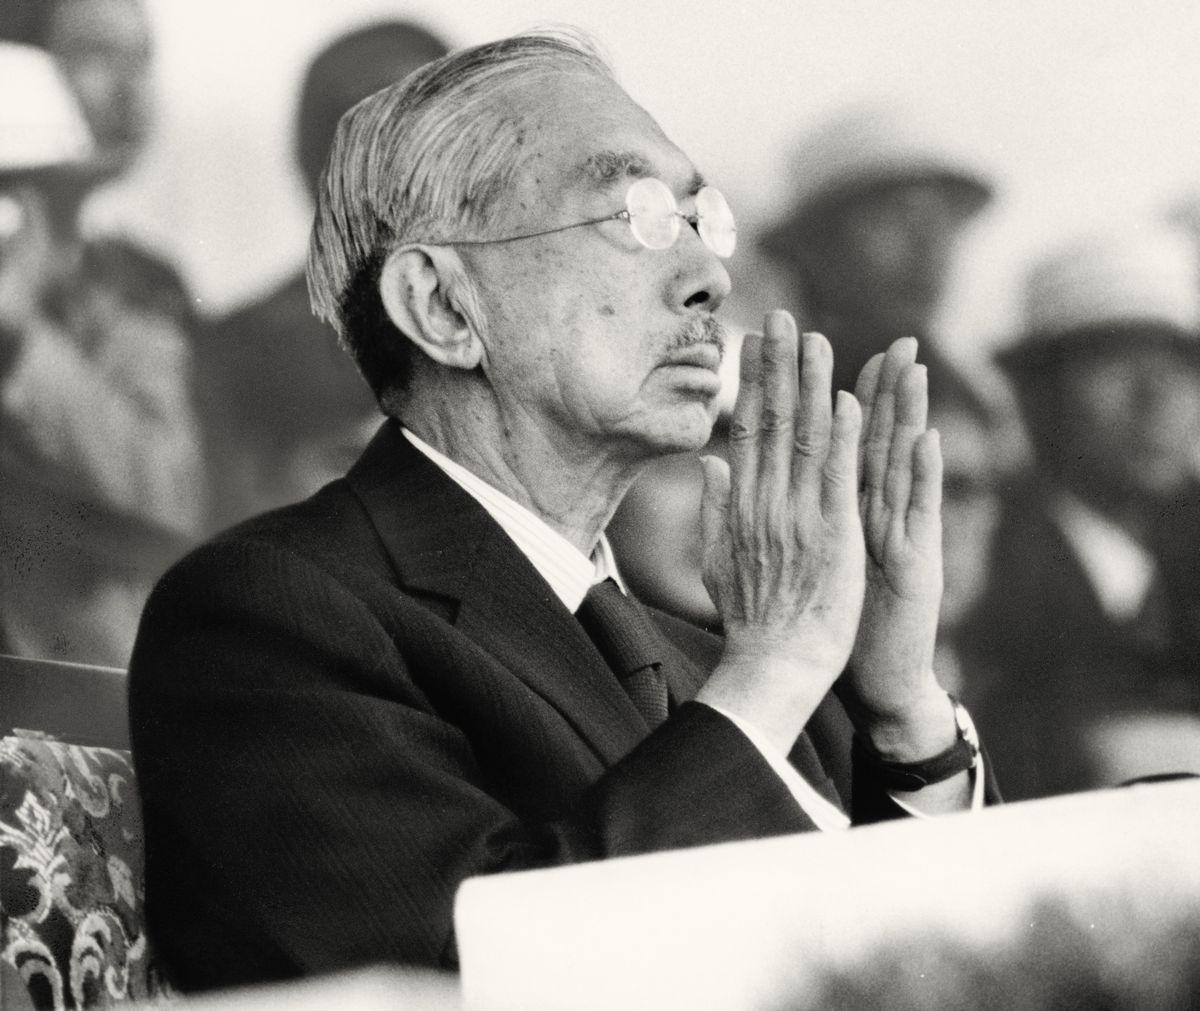 写真・図版 : 1979年10月、第34回国民体育大会の開会式で拍手する昭和天皇=宮崎市。朝日新聞社